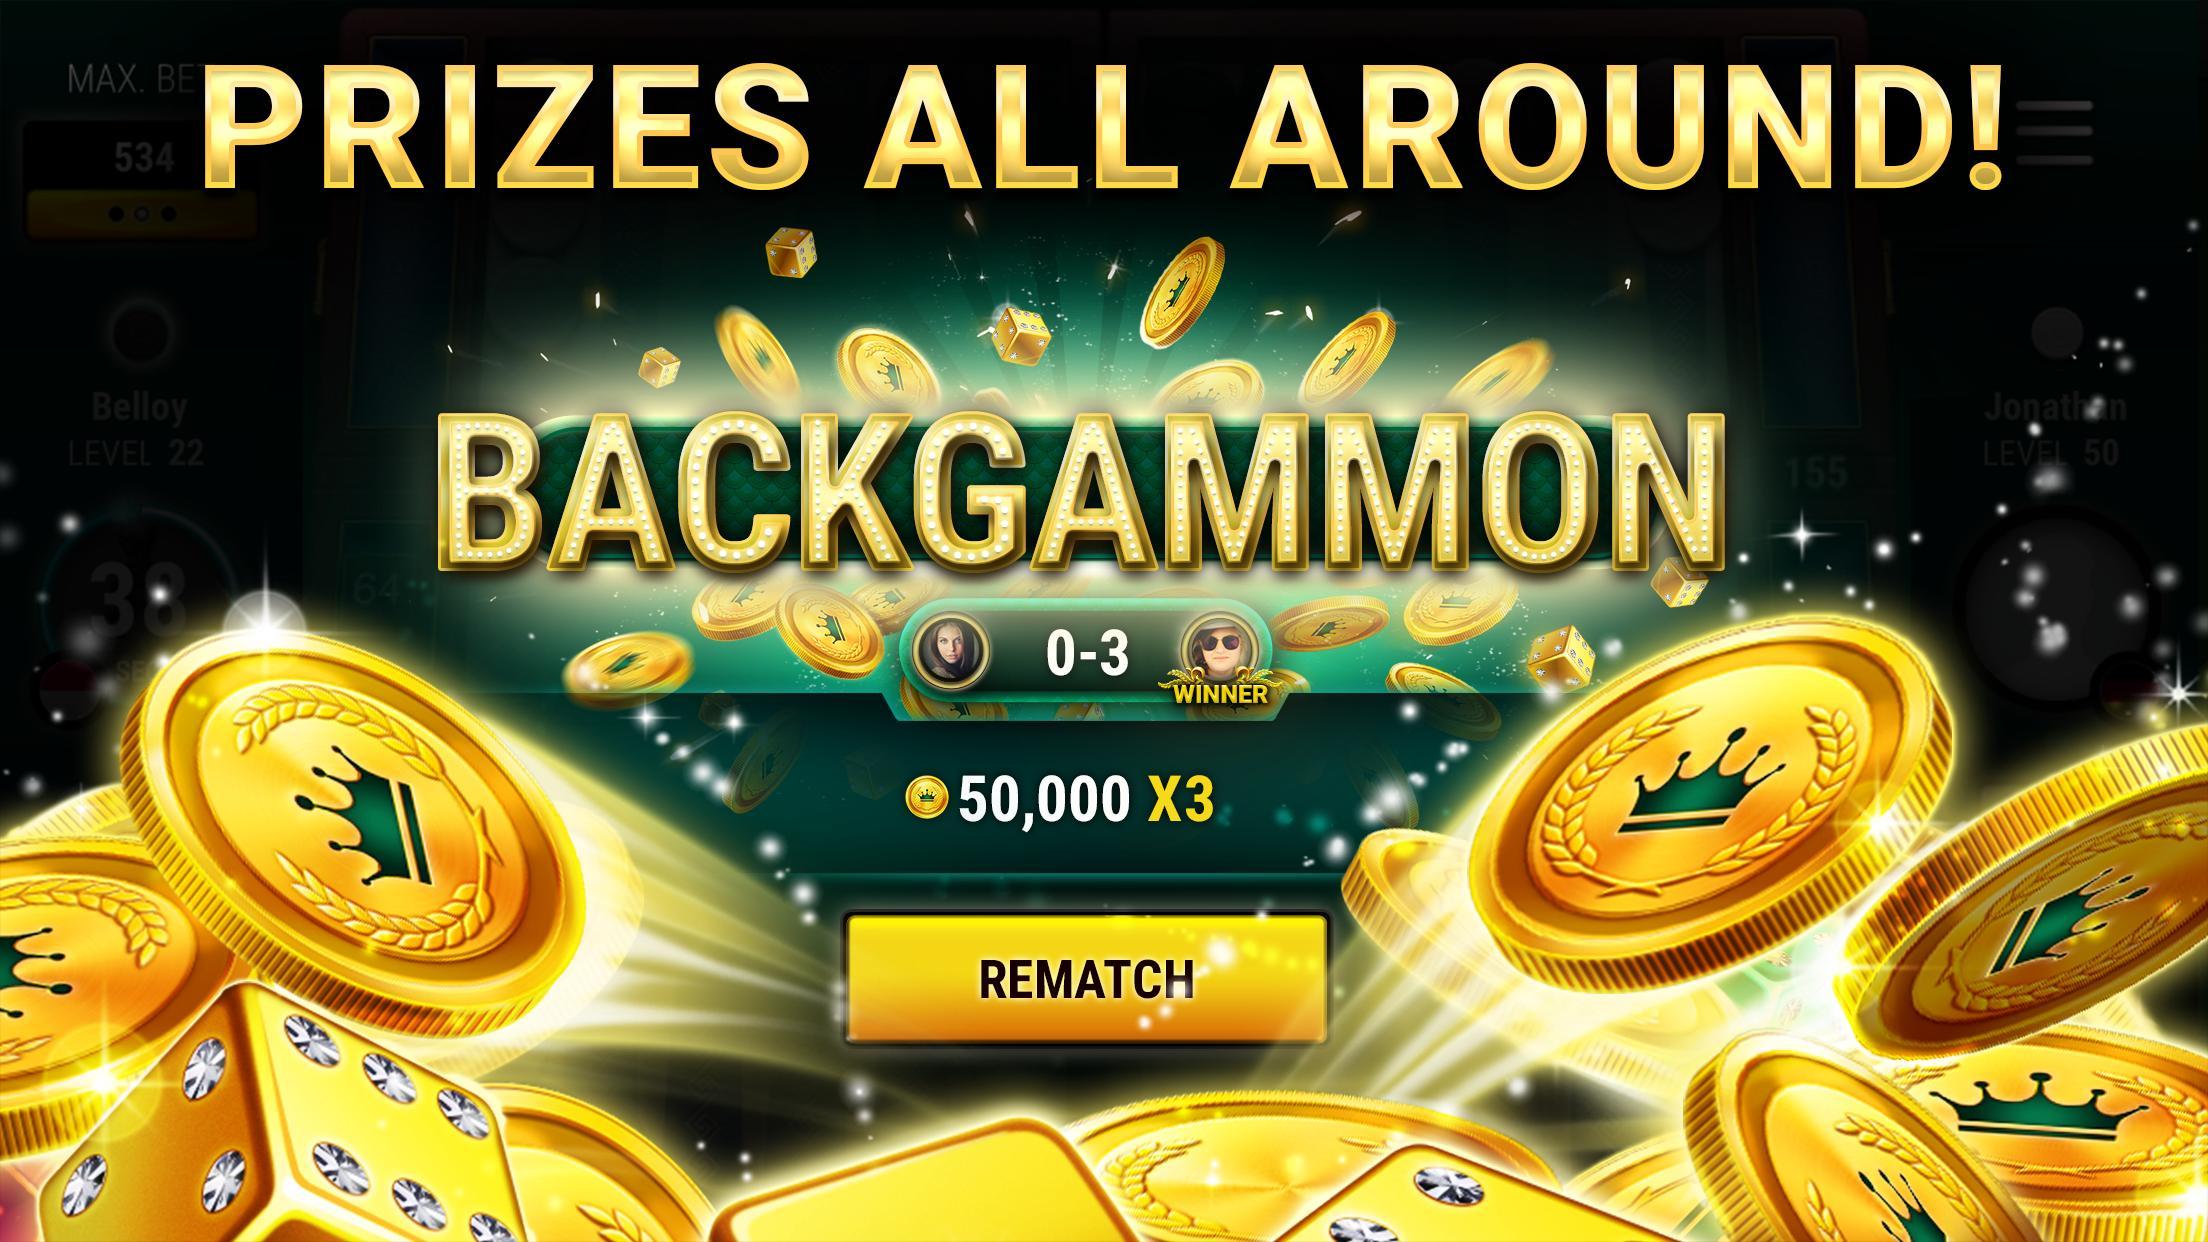 Backgammon Live - Play Online Free Backgammon 3.5.245 Screenshot 13